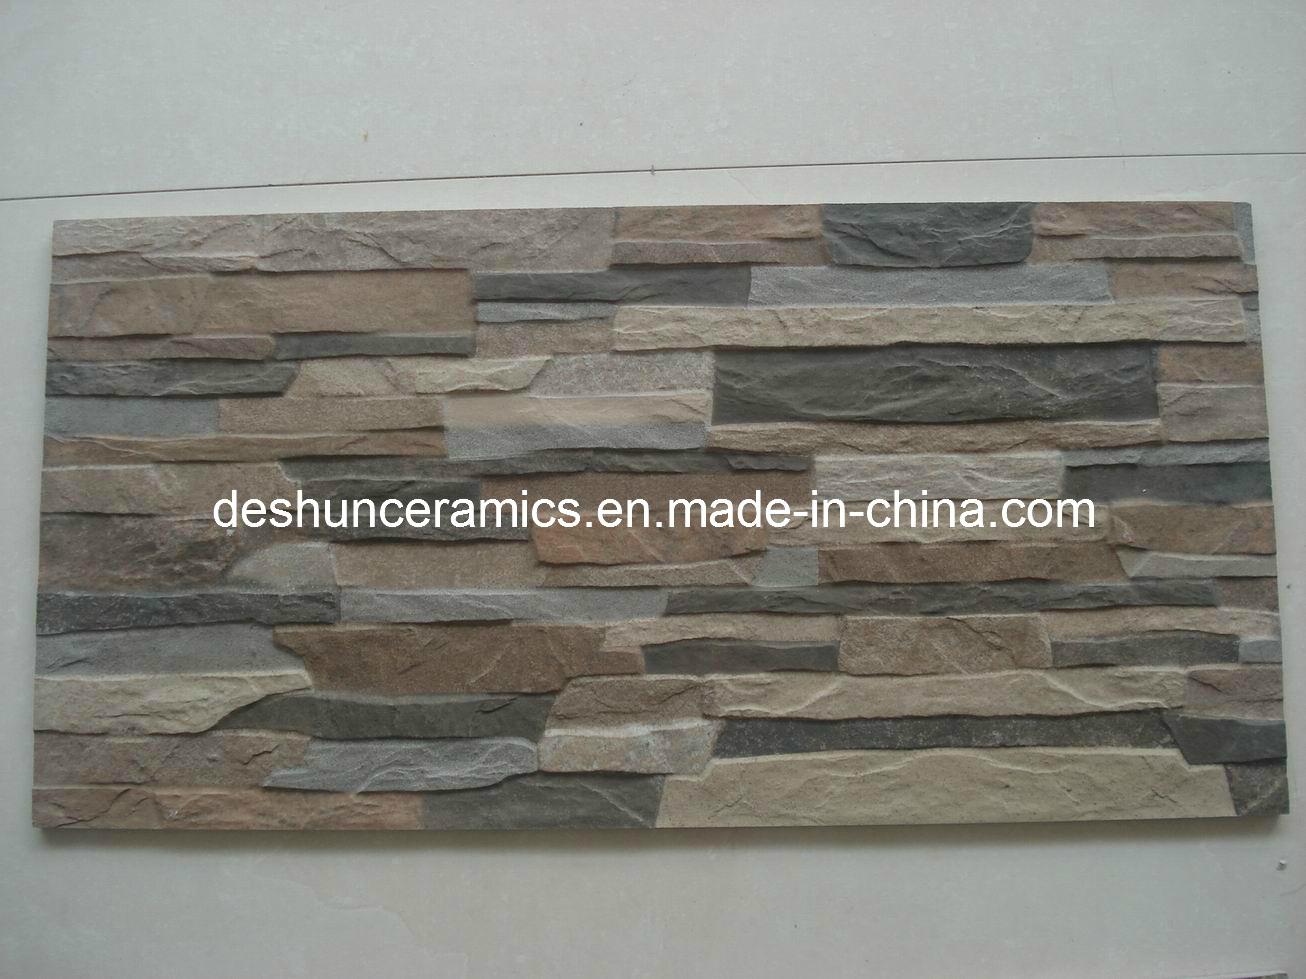 Impresi n de cer mica exterior tile brick 333x500m m del for Ceramica exterior